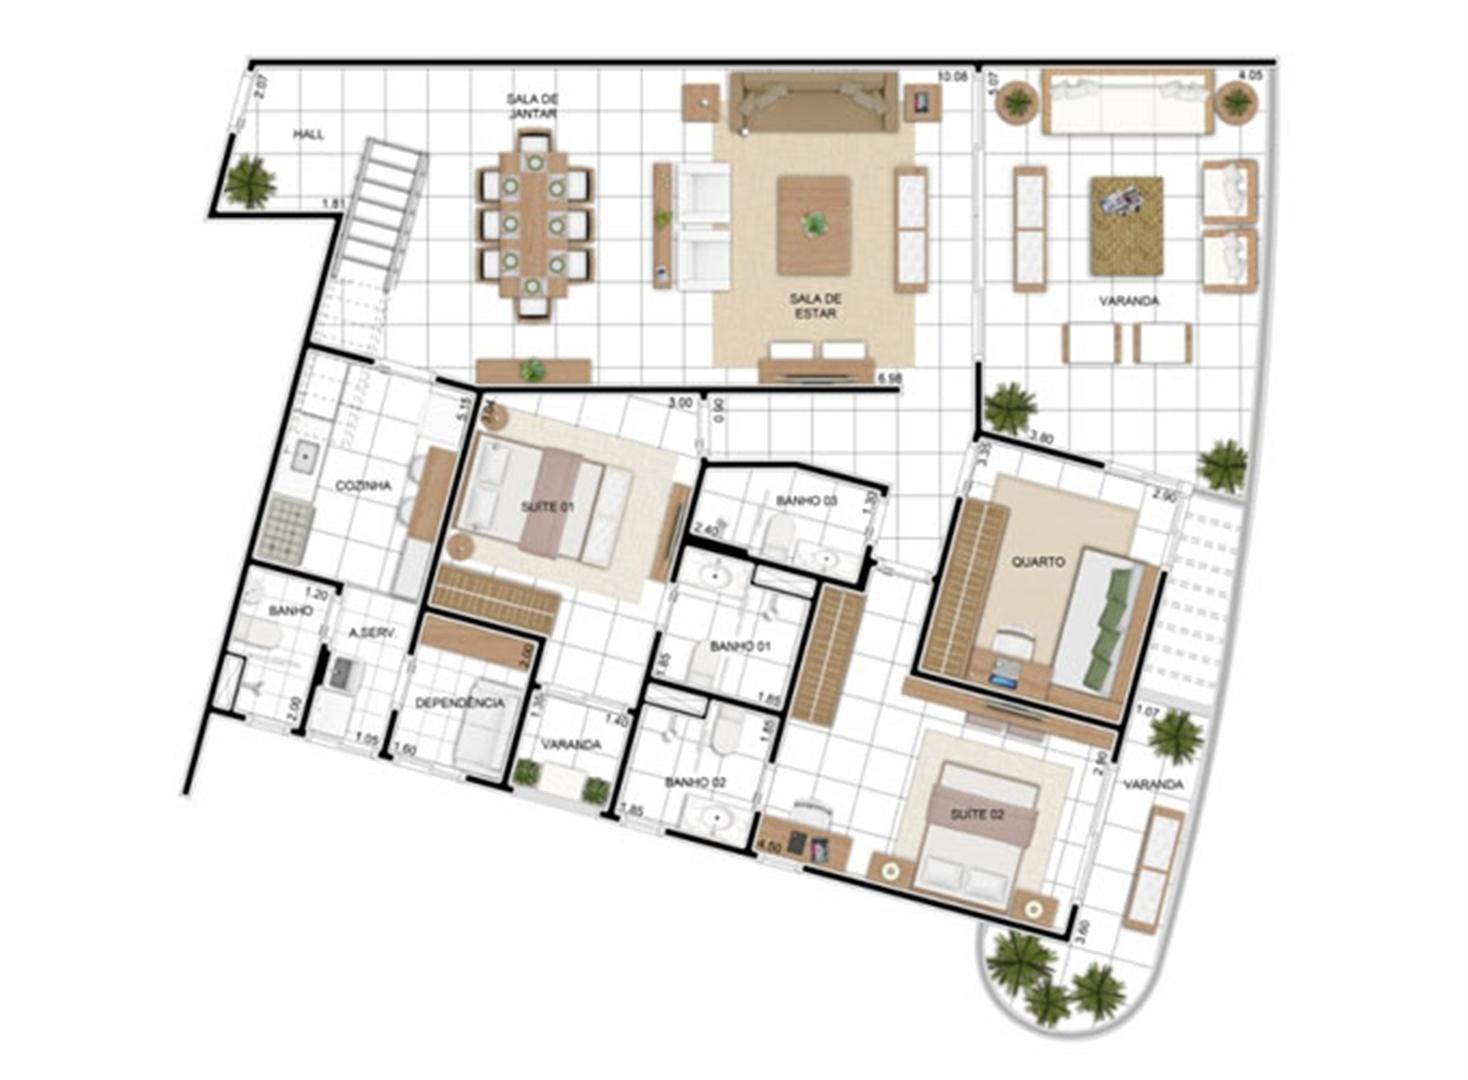 PLANTA - APTO TIPO E - DUPLEX INFERIOR 305 m²  | In Mare Bali – Apartamento no  Distrito Litoral de Cotovelo - Parnamirim - Rio Grande do Norte